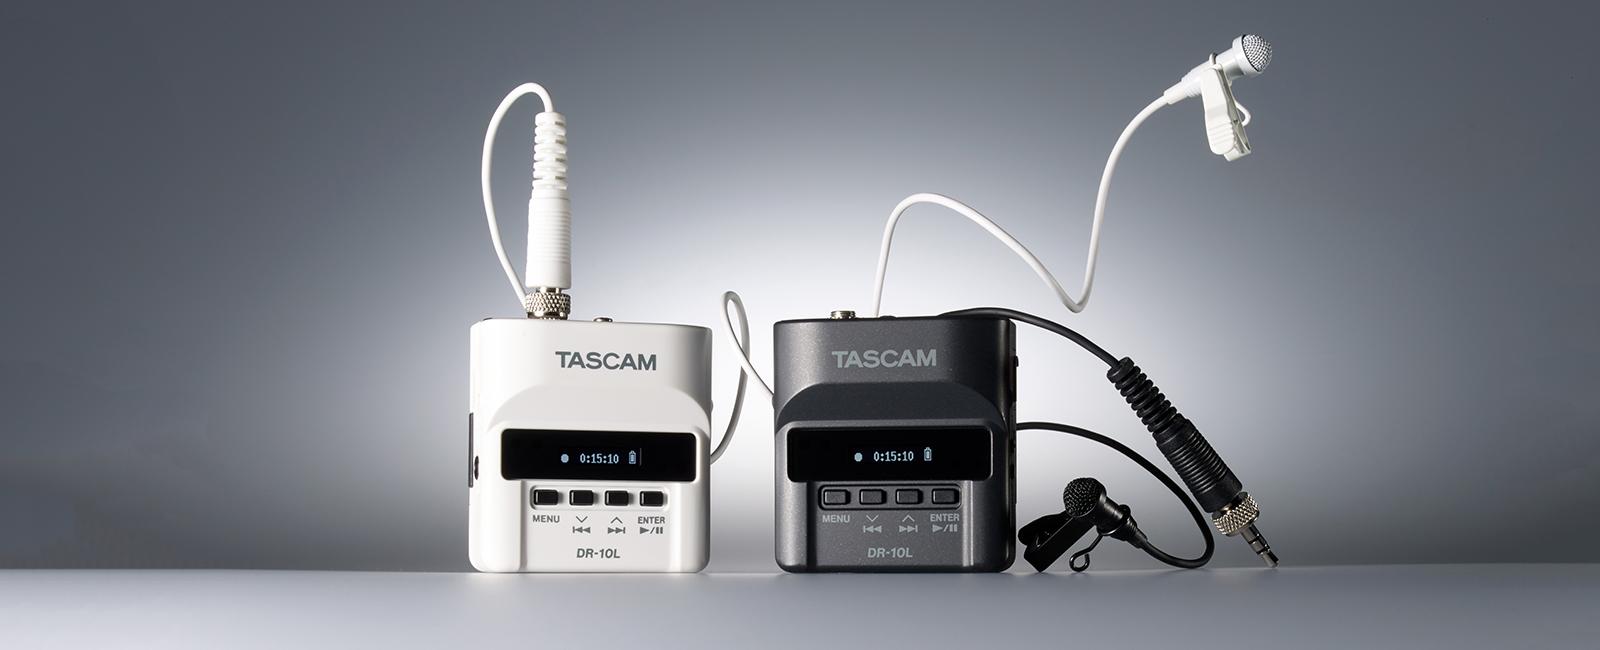 Dr 10l Tascam Teac Wiring Color Code